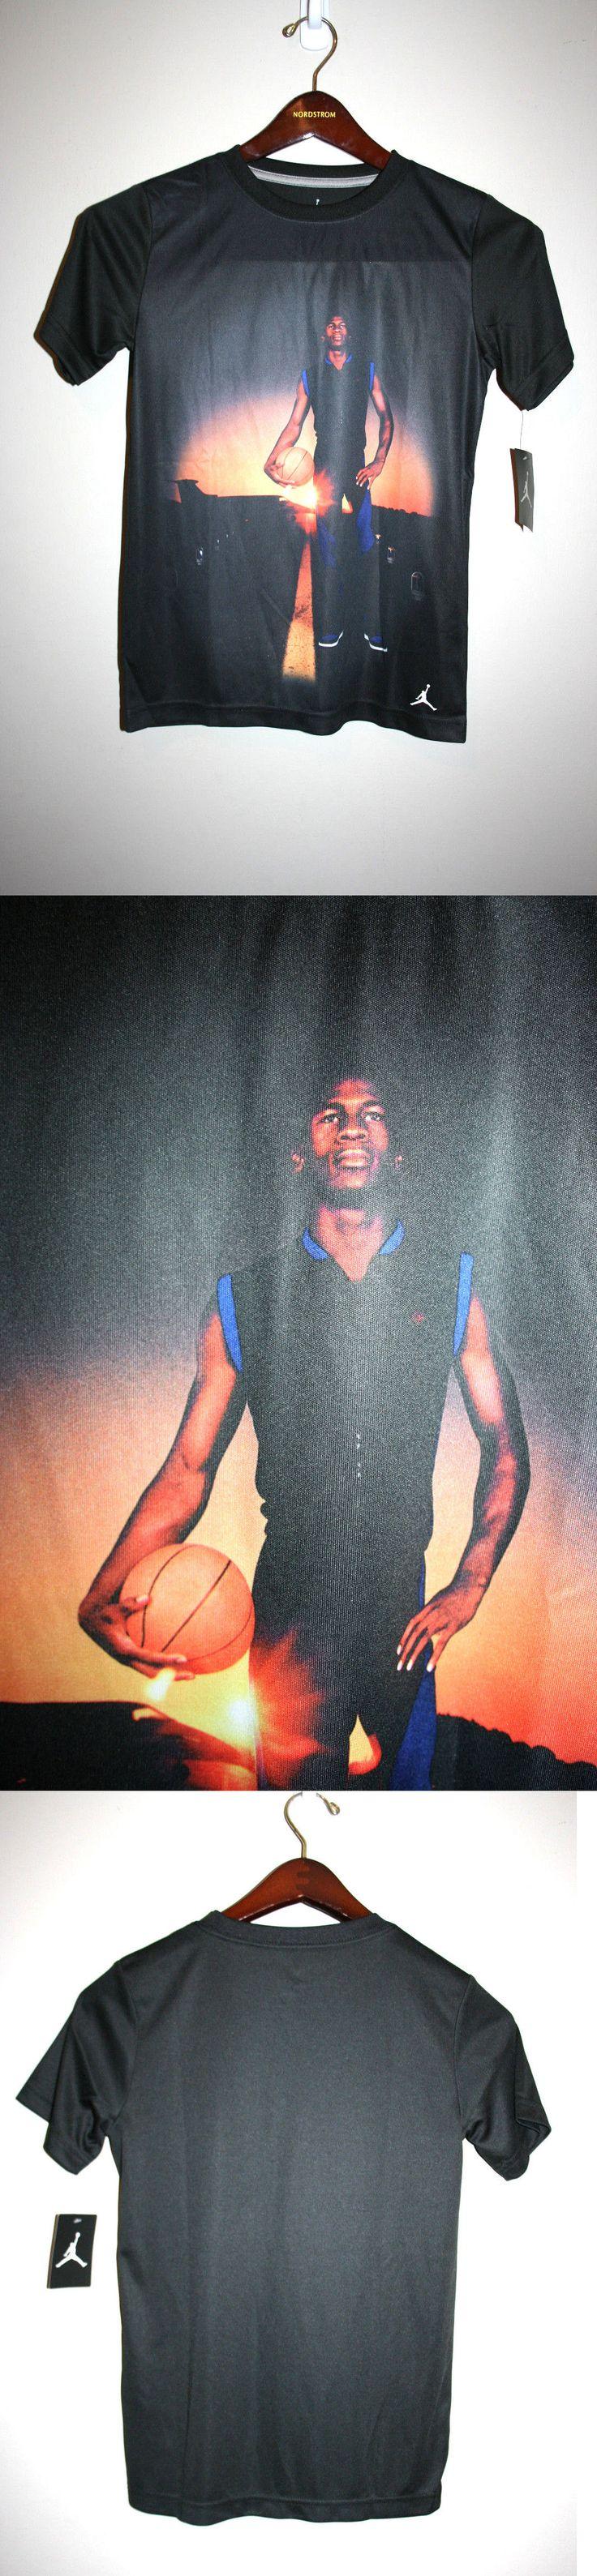 Michael Jordan Baby Clothing: New Boys Michael Jordan Air Black Short Sleeve Basketball T-Shirt 8 10 Nwt -> BUY IT NOW ONLY: $19.95 on eBay!